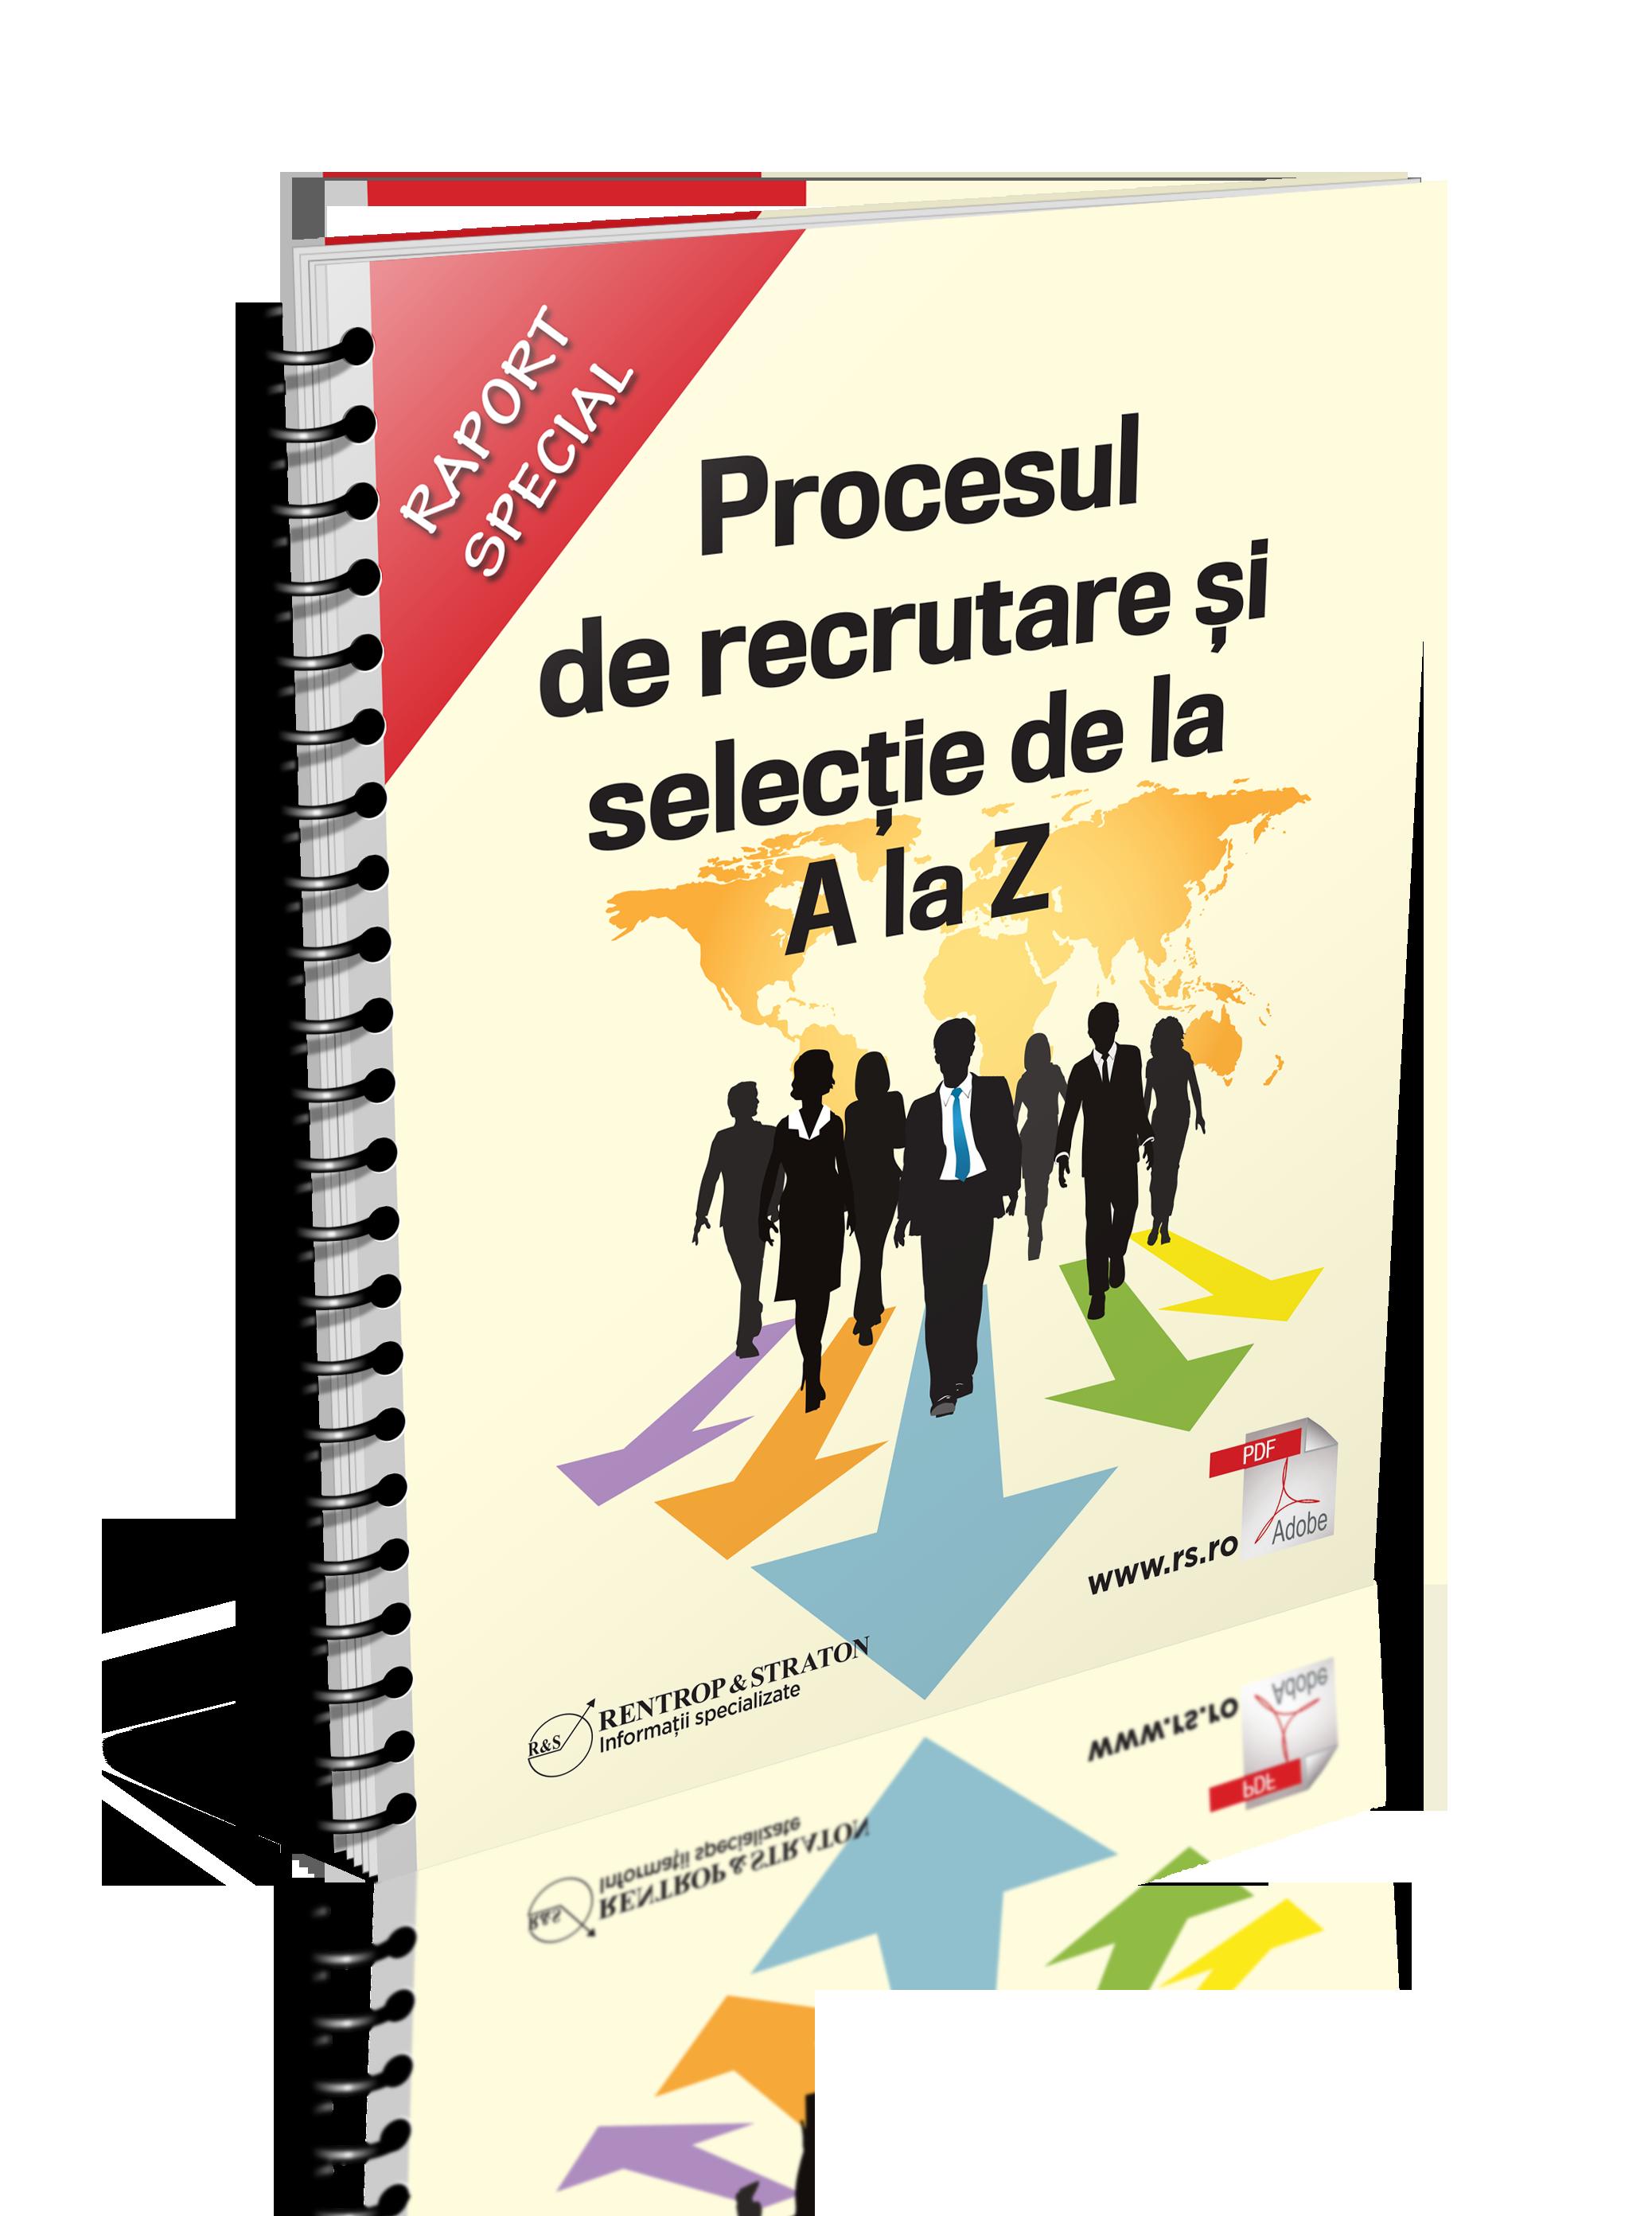 Procesul de recrutare si selectie de la A la Z